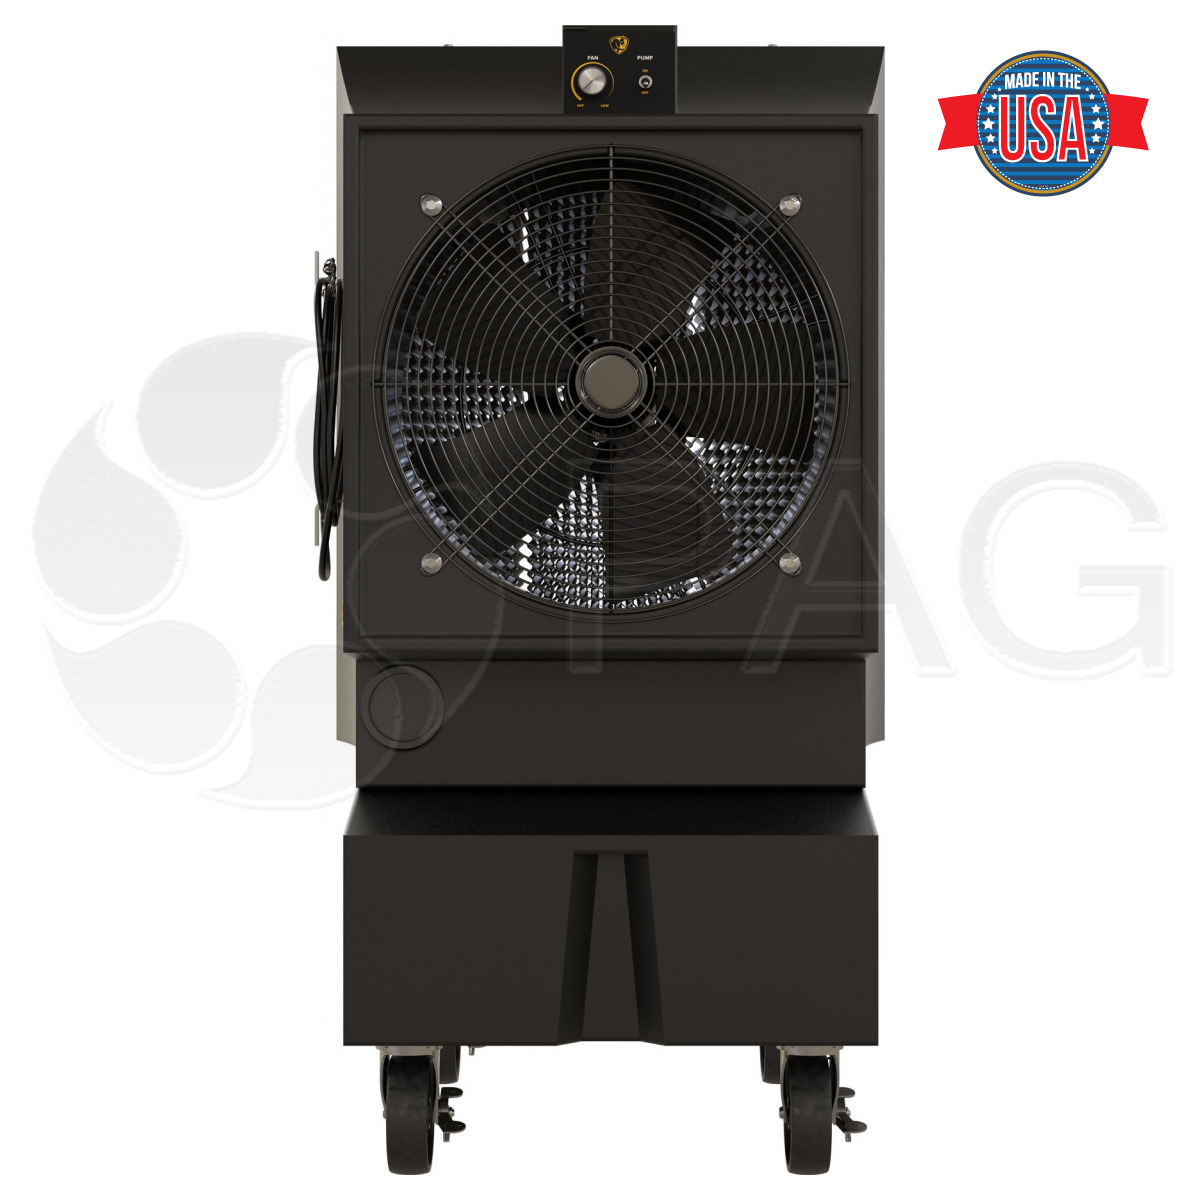 Big Ass Fans Cold Front 300 Evaporative Cooler front view